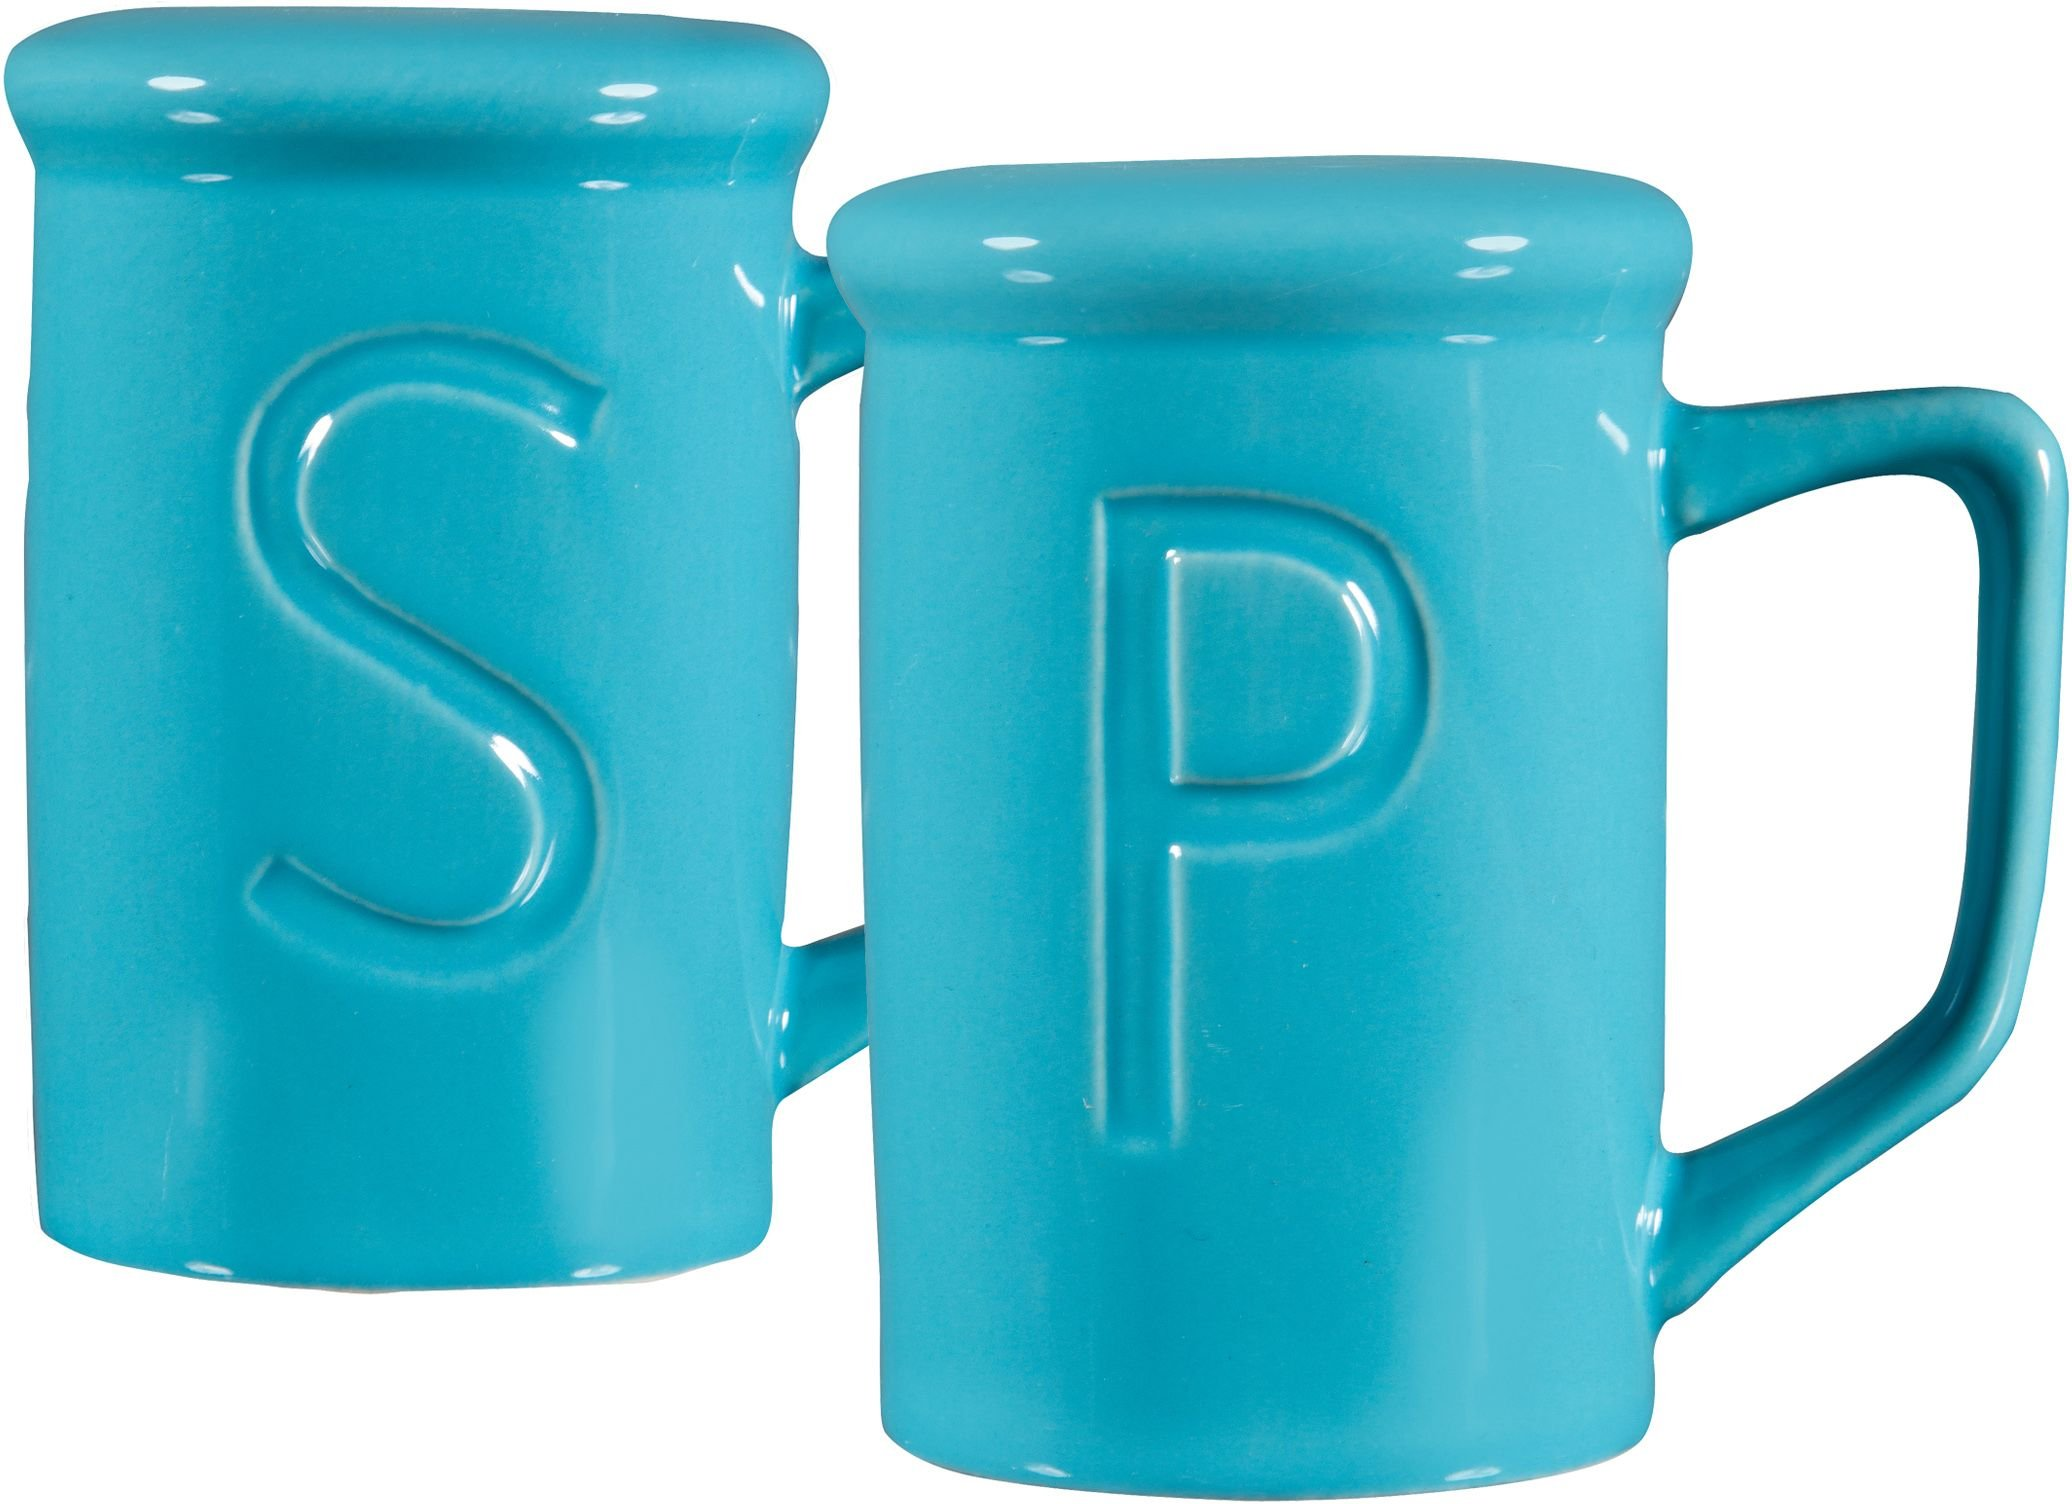 CERAMIC SALT AND PEPPER SHAKER SETS-''S'' &''P'' EMBOSSED